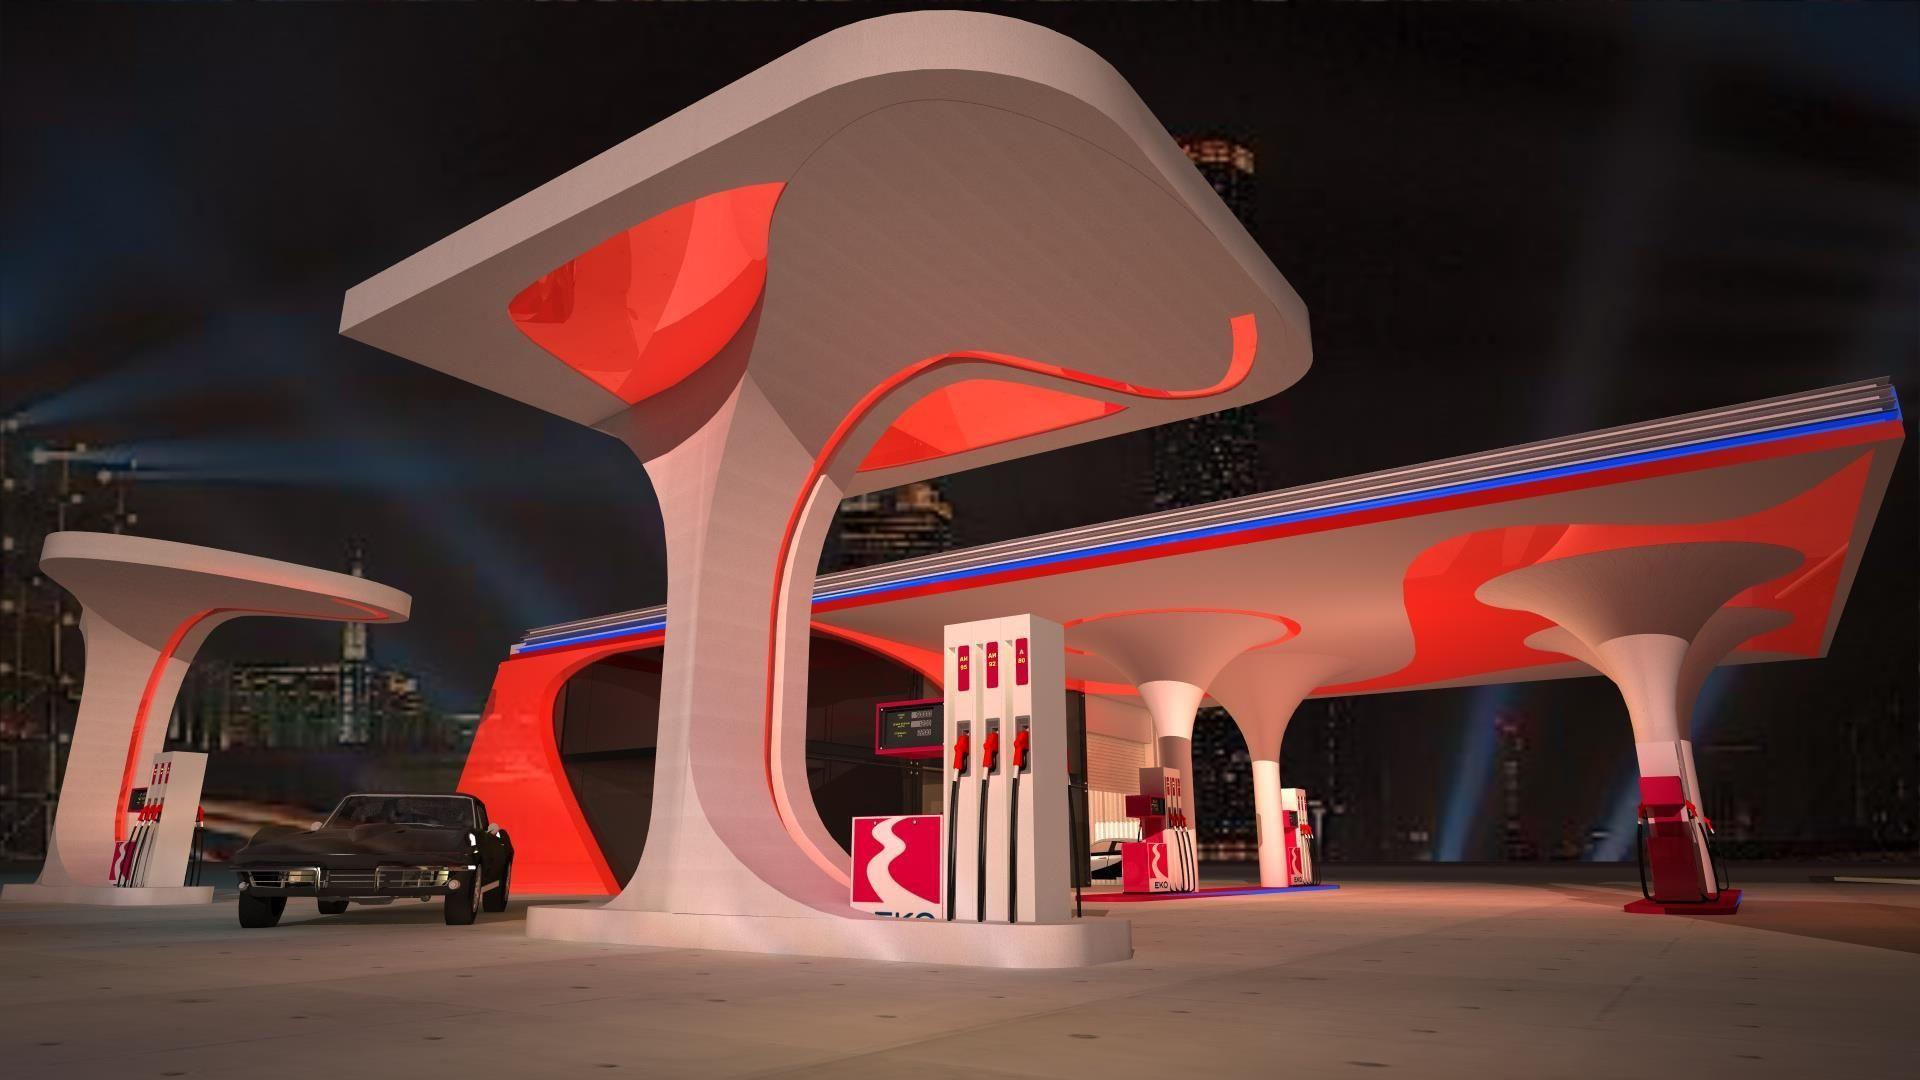 Pin by Arphatcha Jongpaiboon on 12 Gas station, Petrol